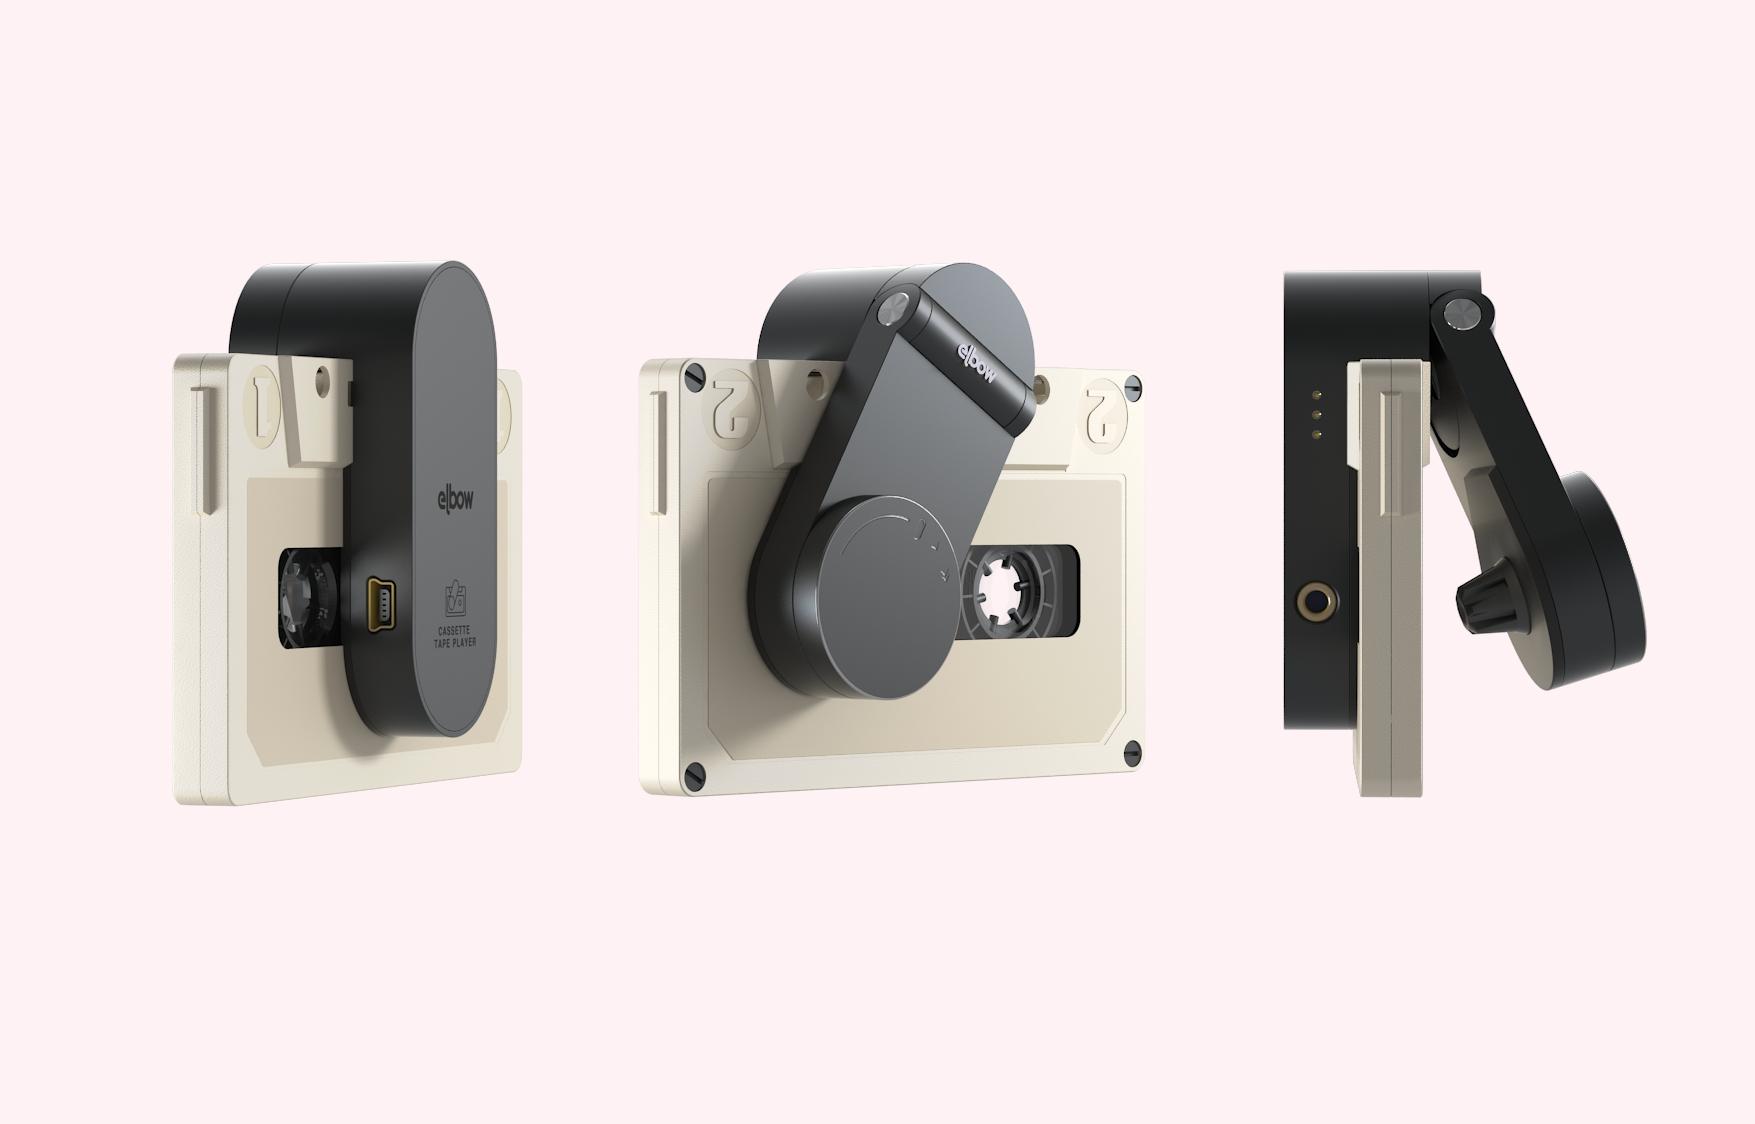 Elbow - Minimalist Cassette Player